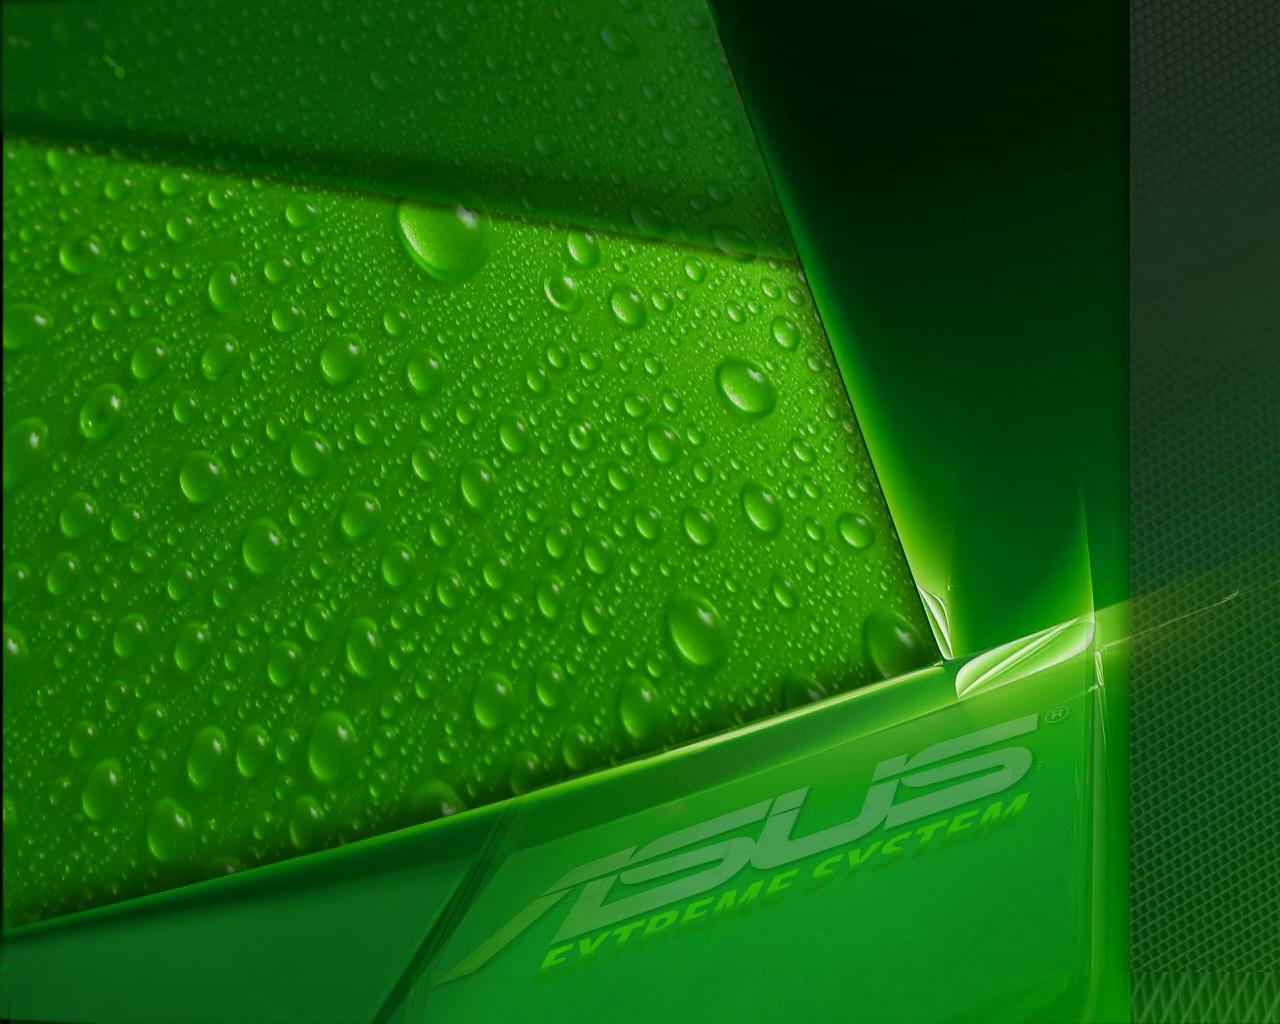 ASUS WALLPAPER-Green By Kukima On DeviantArt